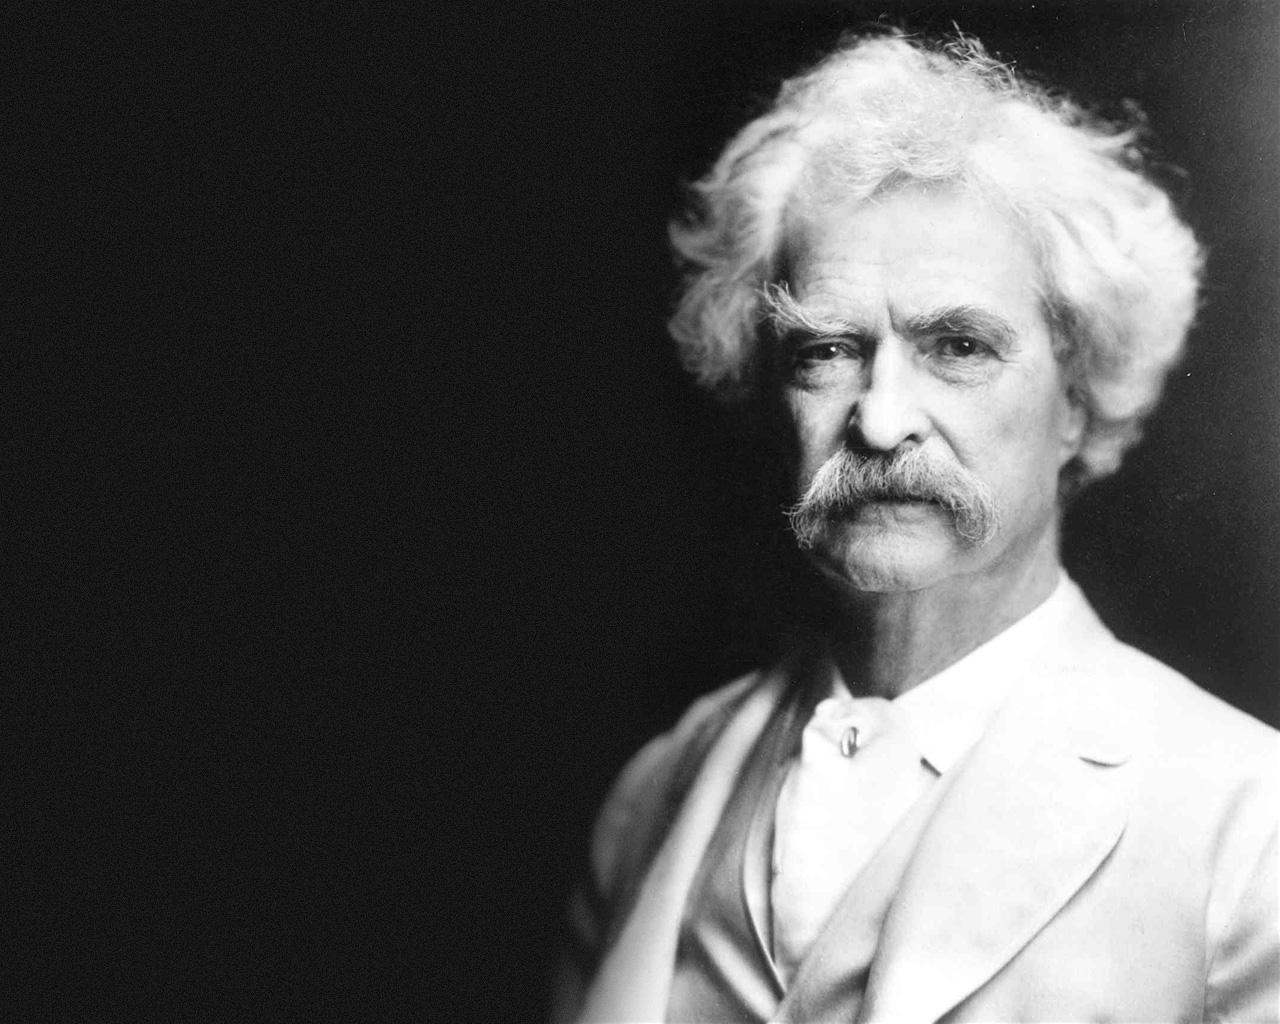 Mark_Twain-2.jpg